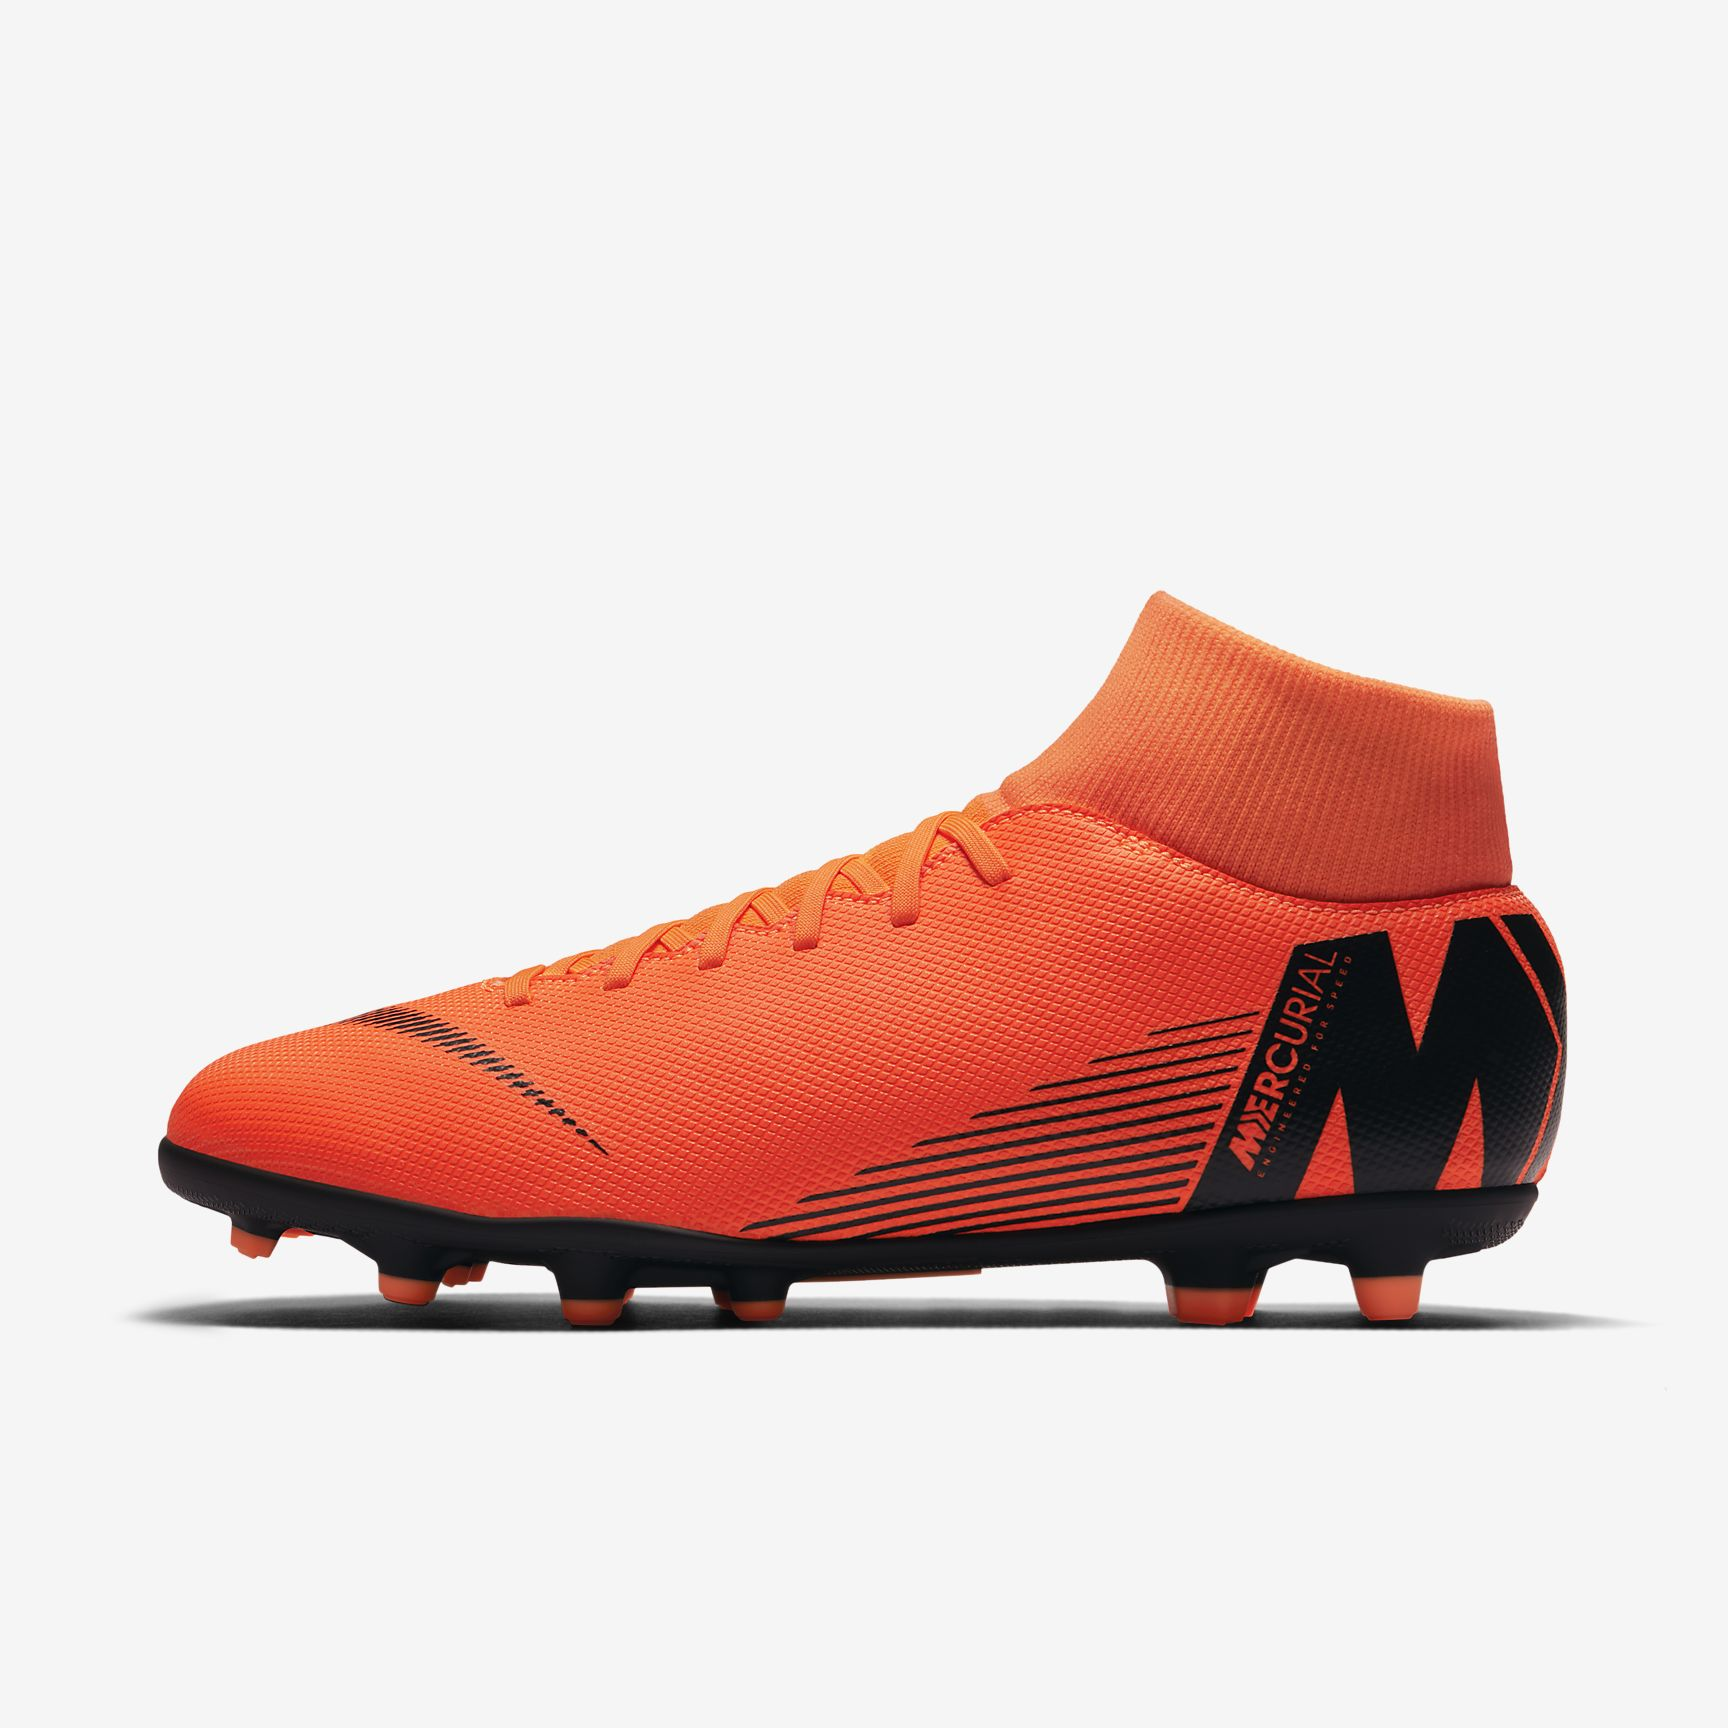 chaussures-football-Nike-Mercurial-Superfly-VI-Club-img1